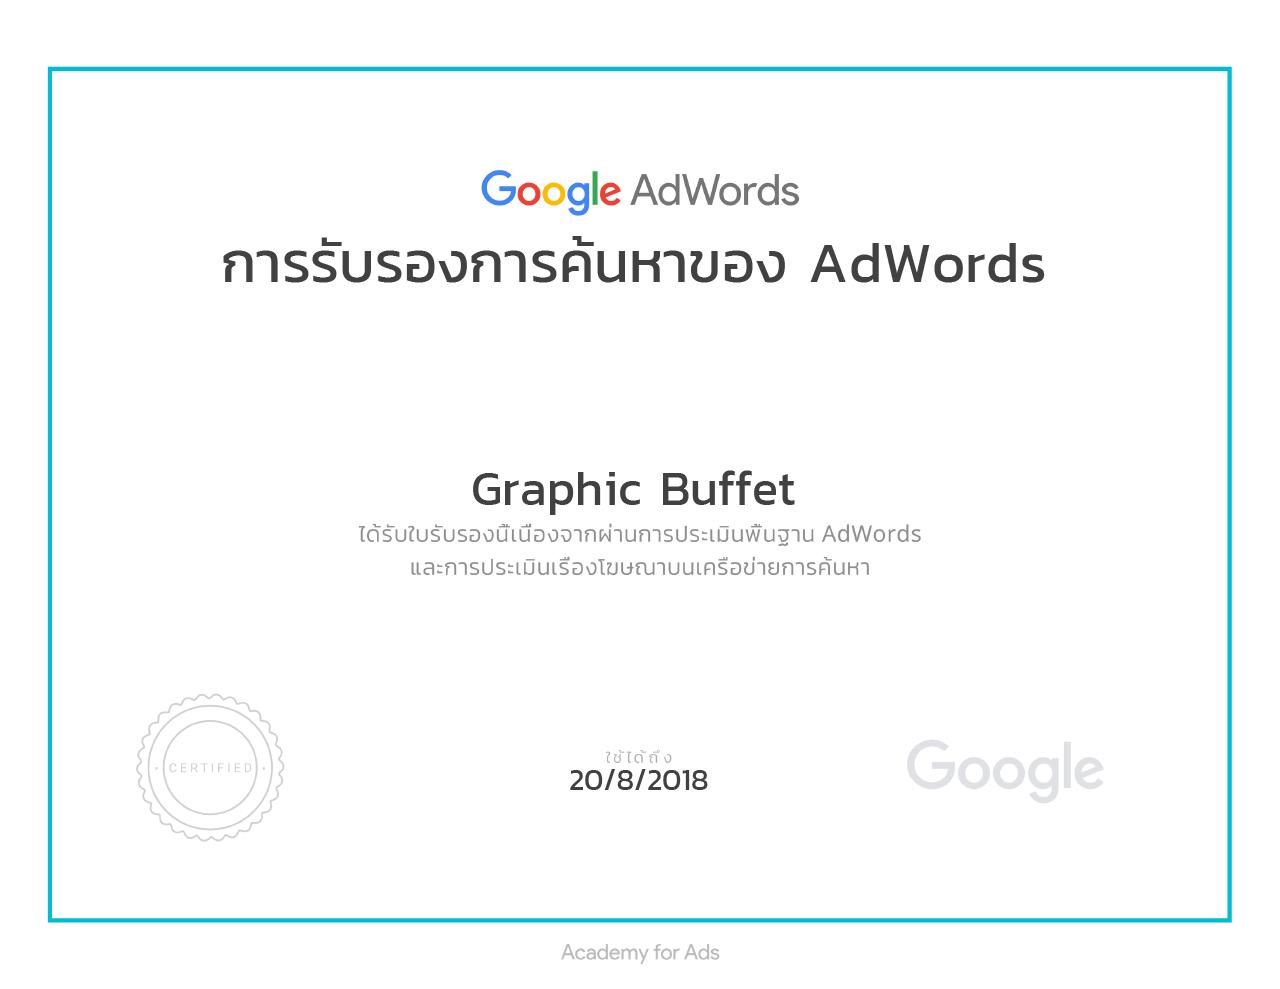 certificate 03632 6832679 รับทำ Google Adwords